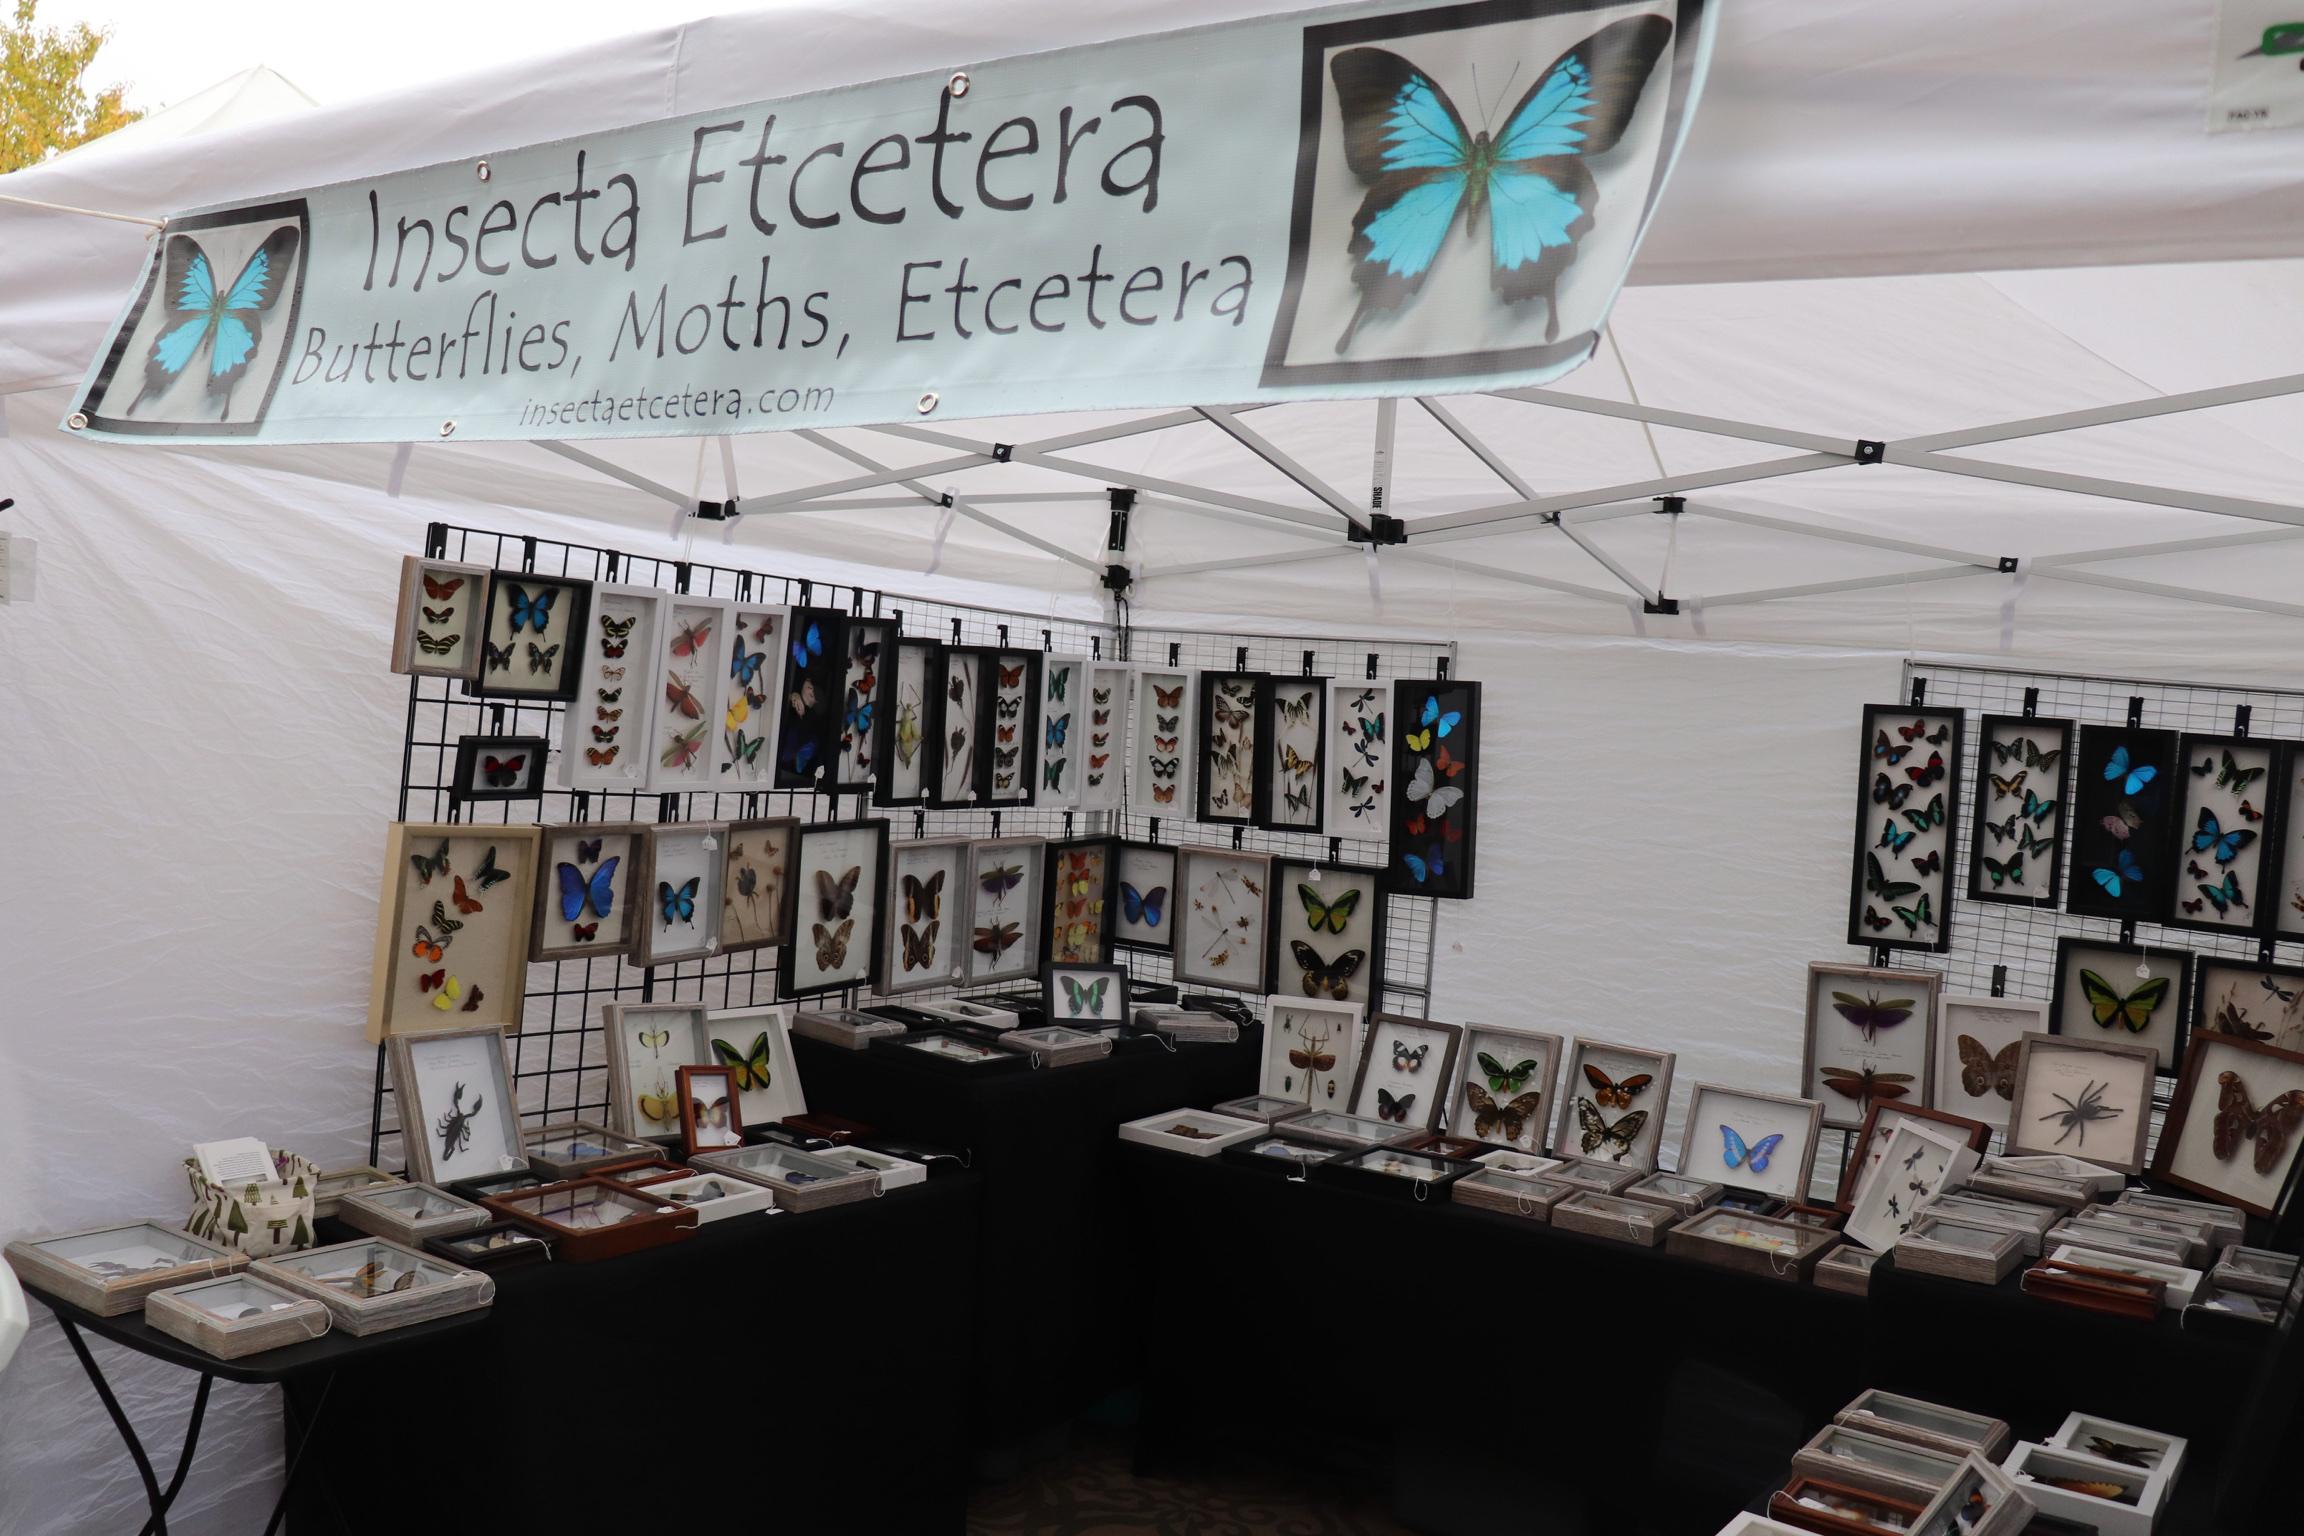 Insecta Etcetera. Photo courtesy of Nathan Casanova